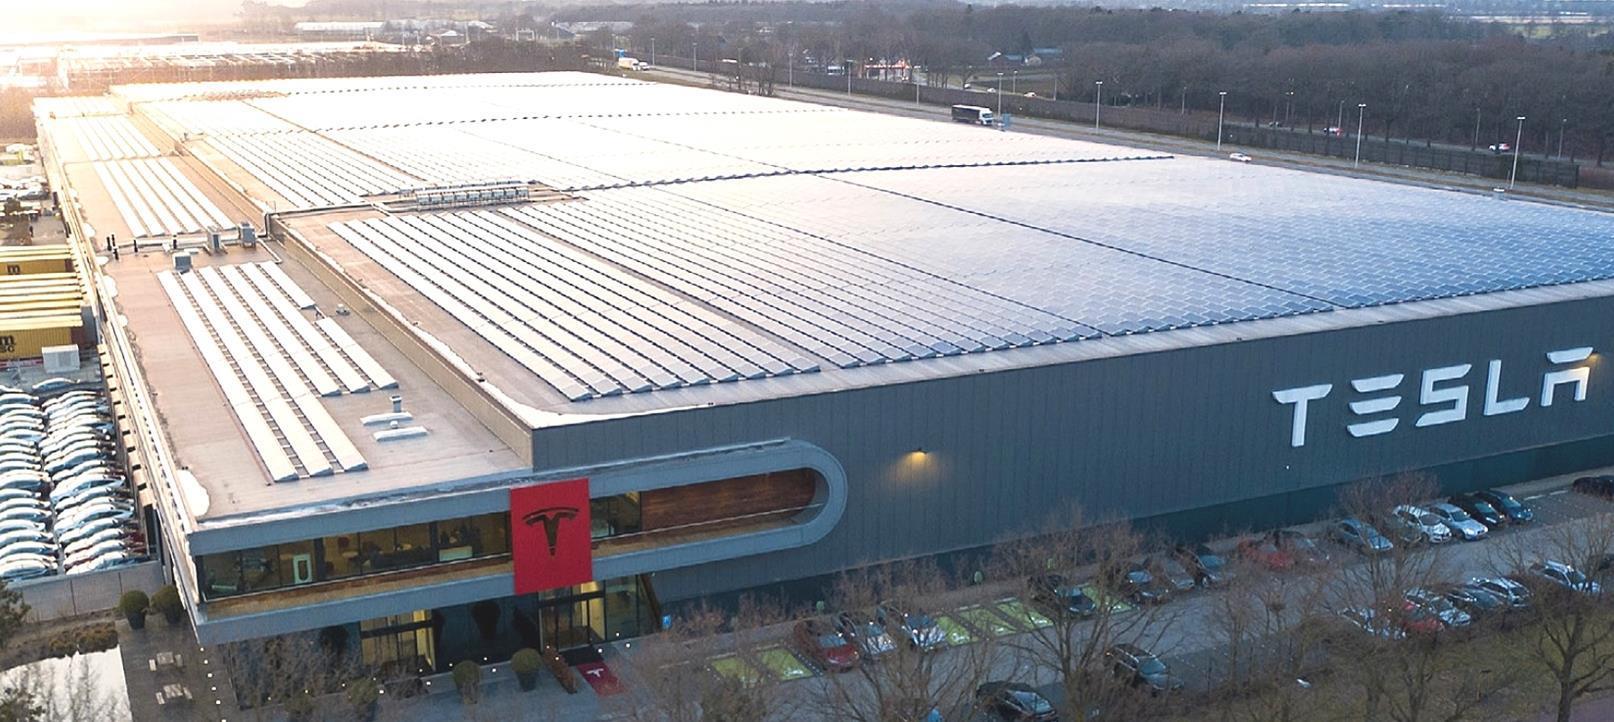 69m806 Tesla prevoit de lancer la production de sa Gigafactory en Allemagne LwjeYt6g6 2 4